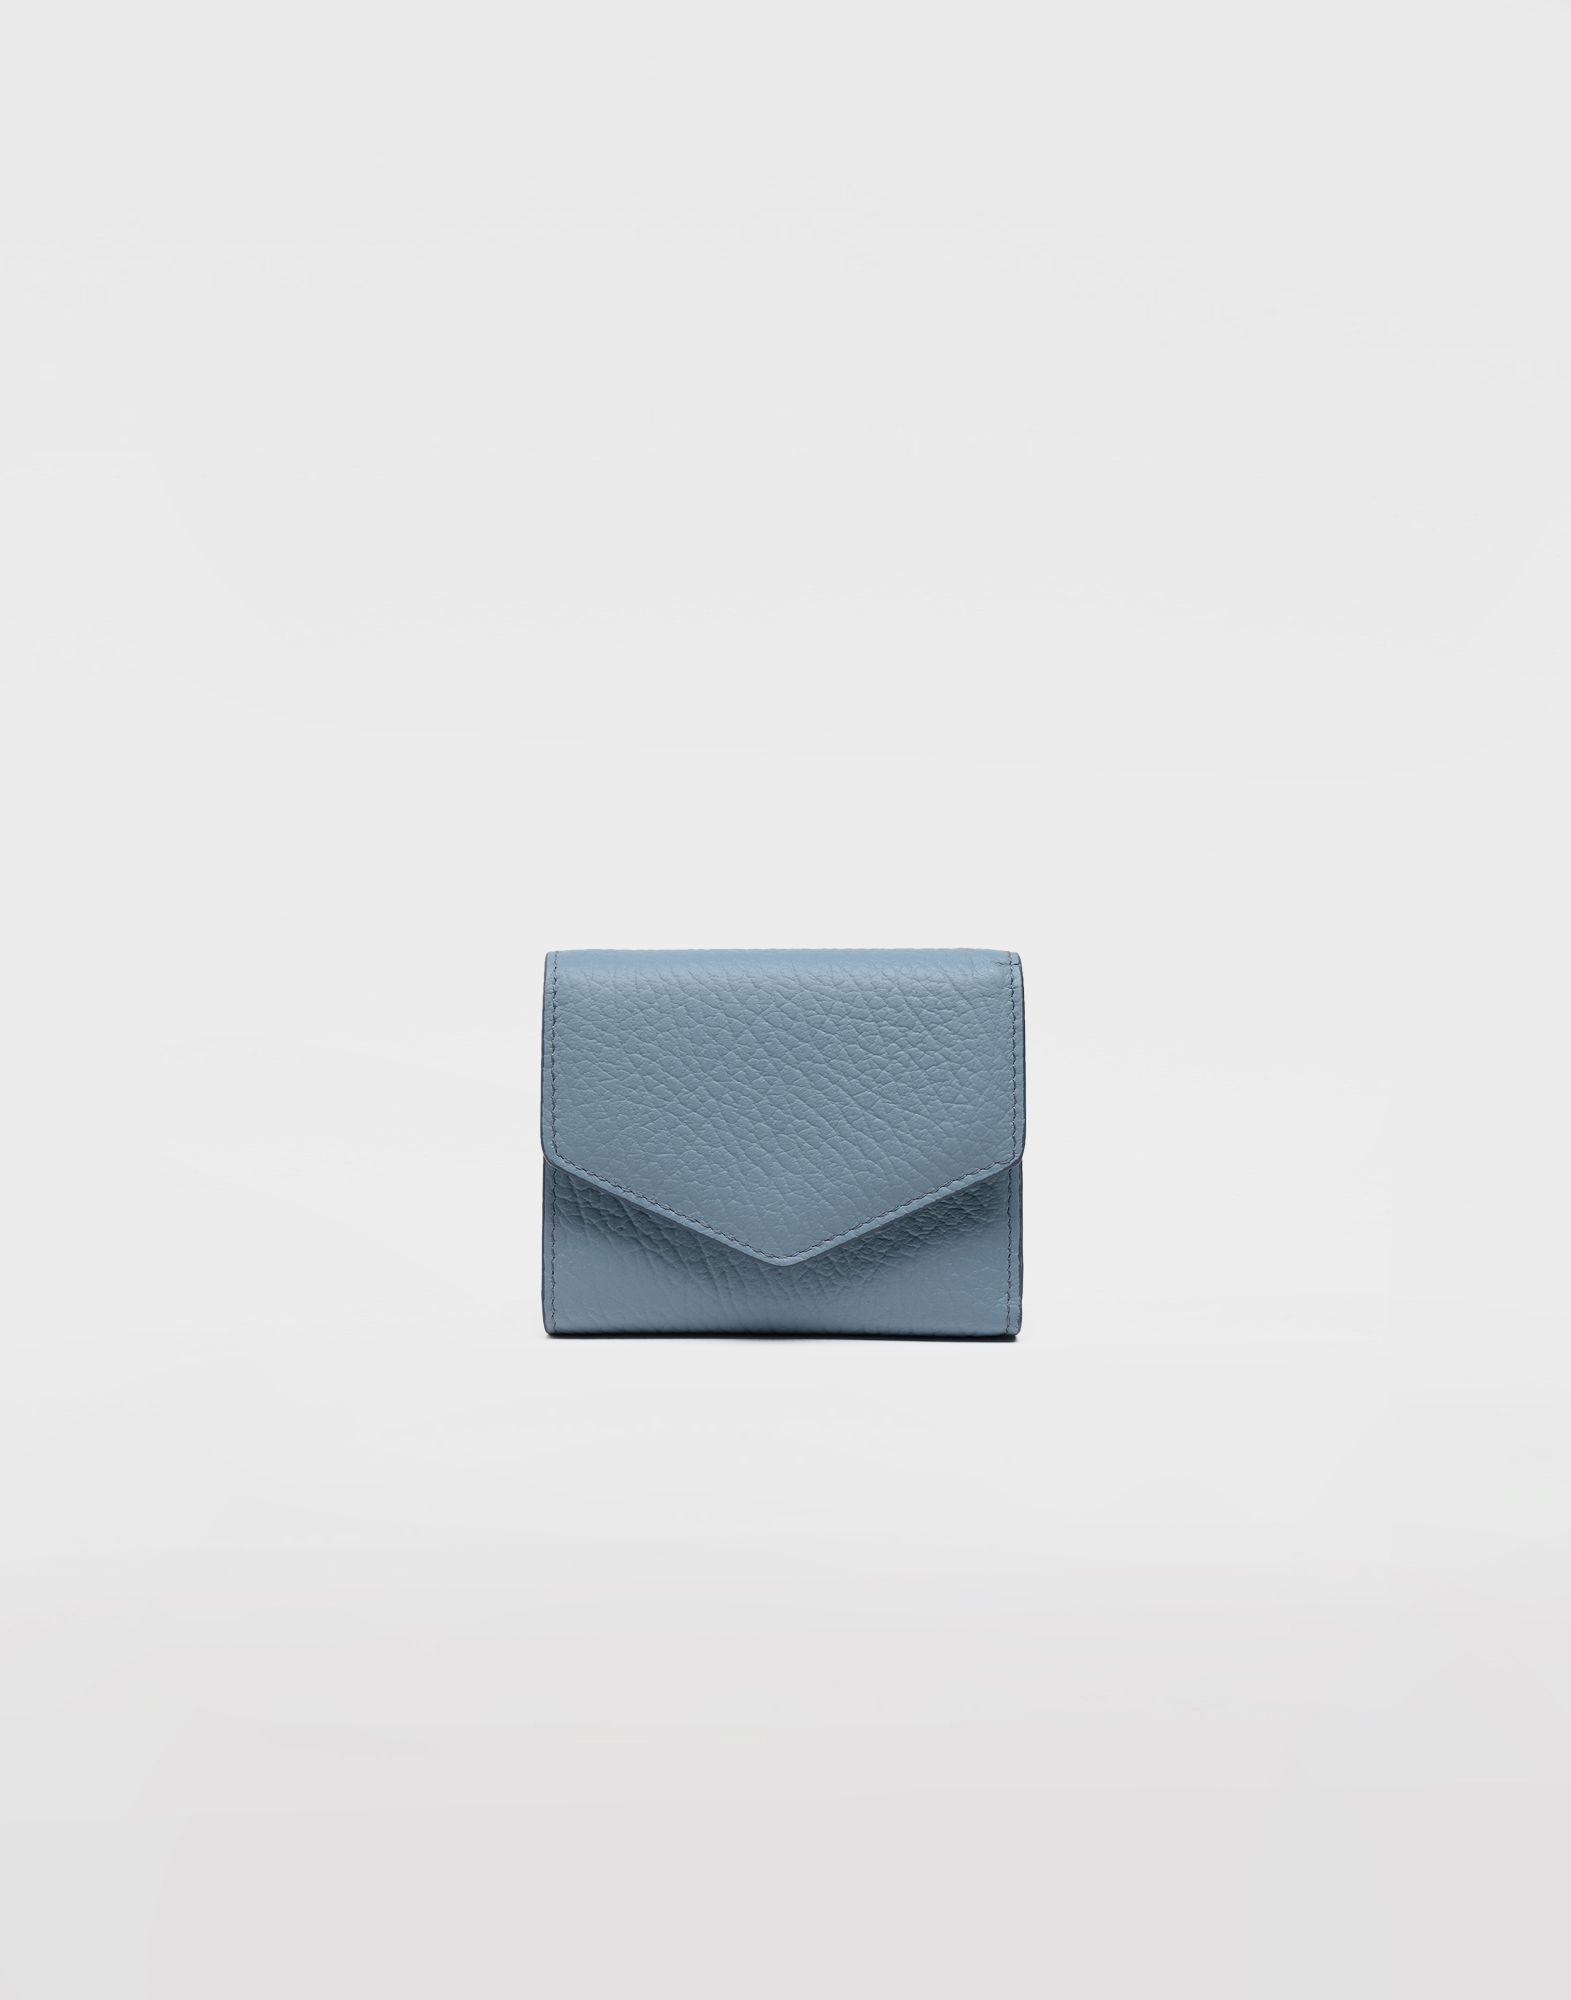 MAISON MARGIELA Envelope leather wallet Wallet Woman f